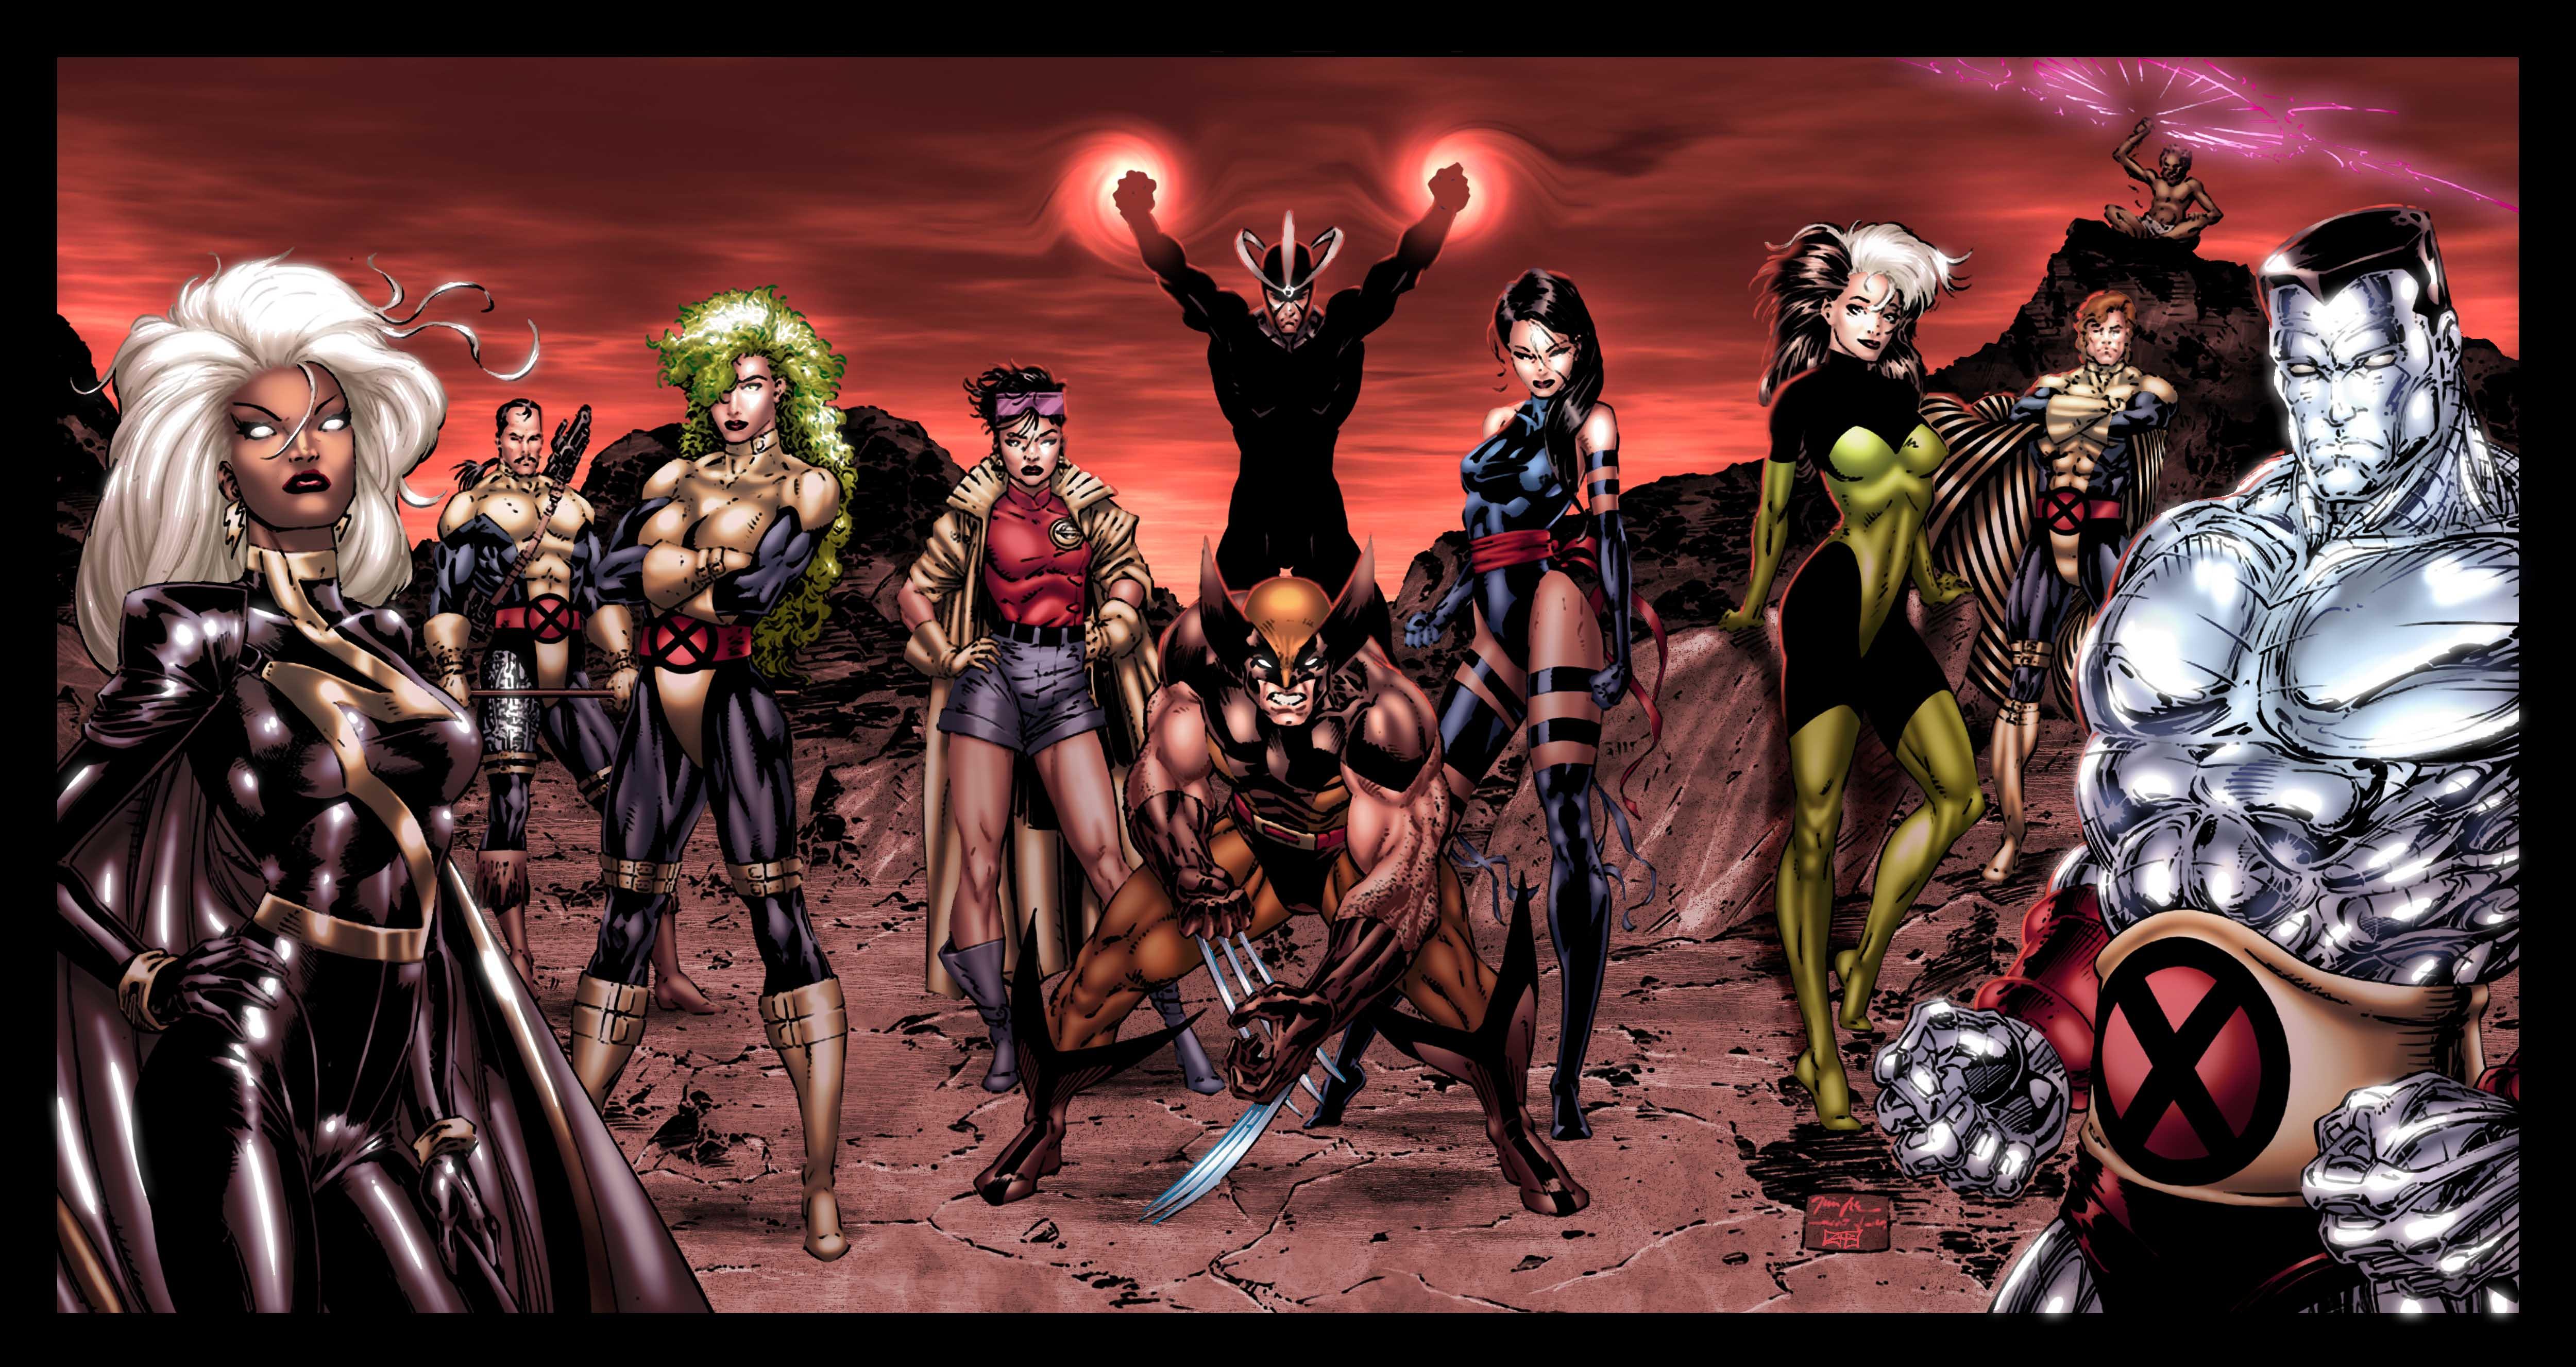 90s x men comic wallpaper - photo #7